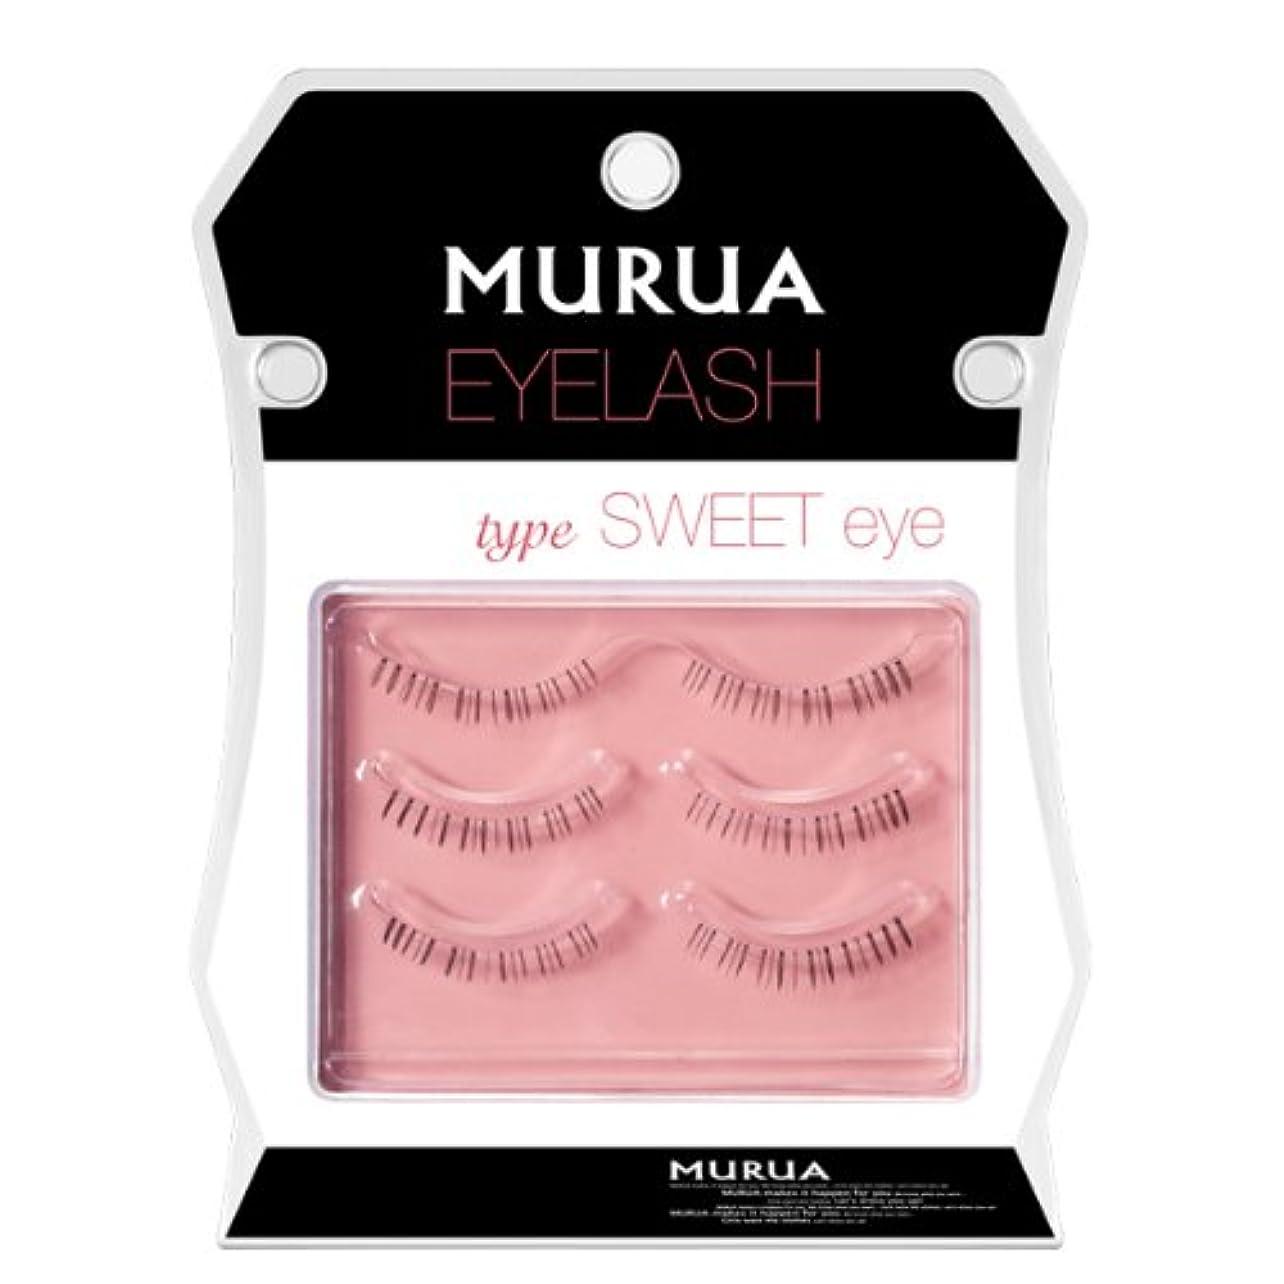 MURUA EYELASH SWEET eye (下まつげ)